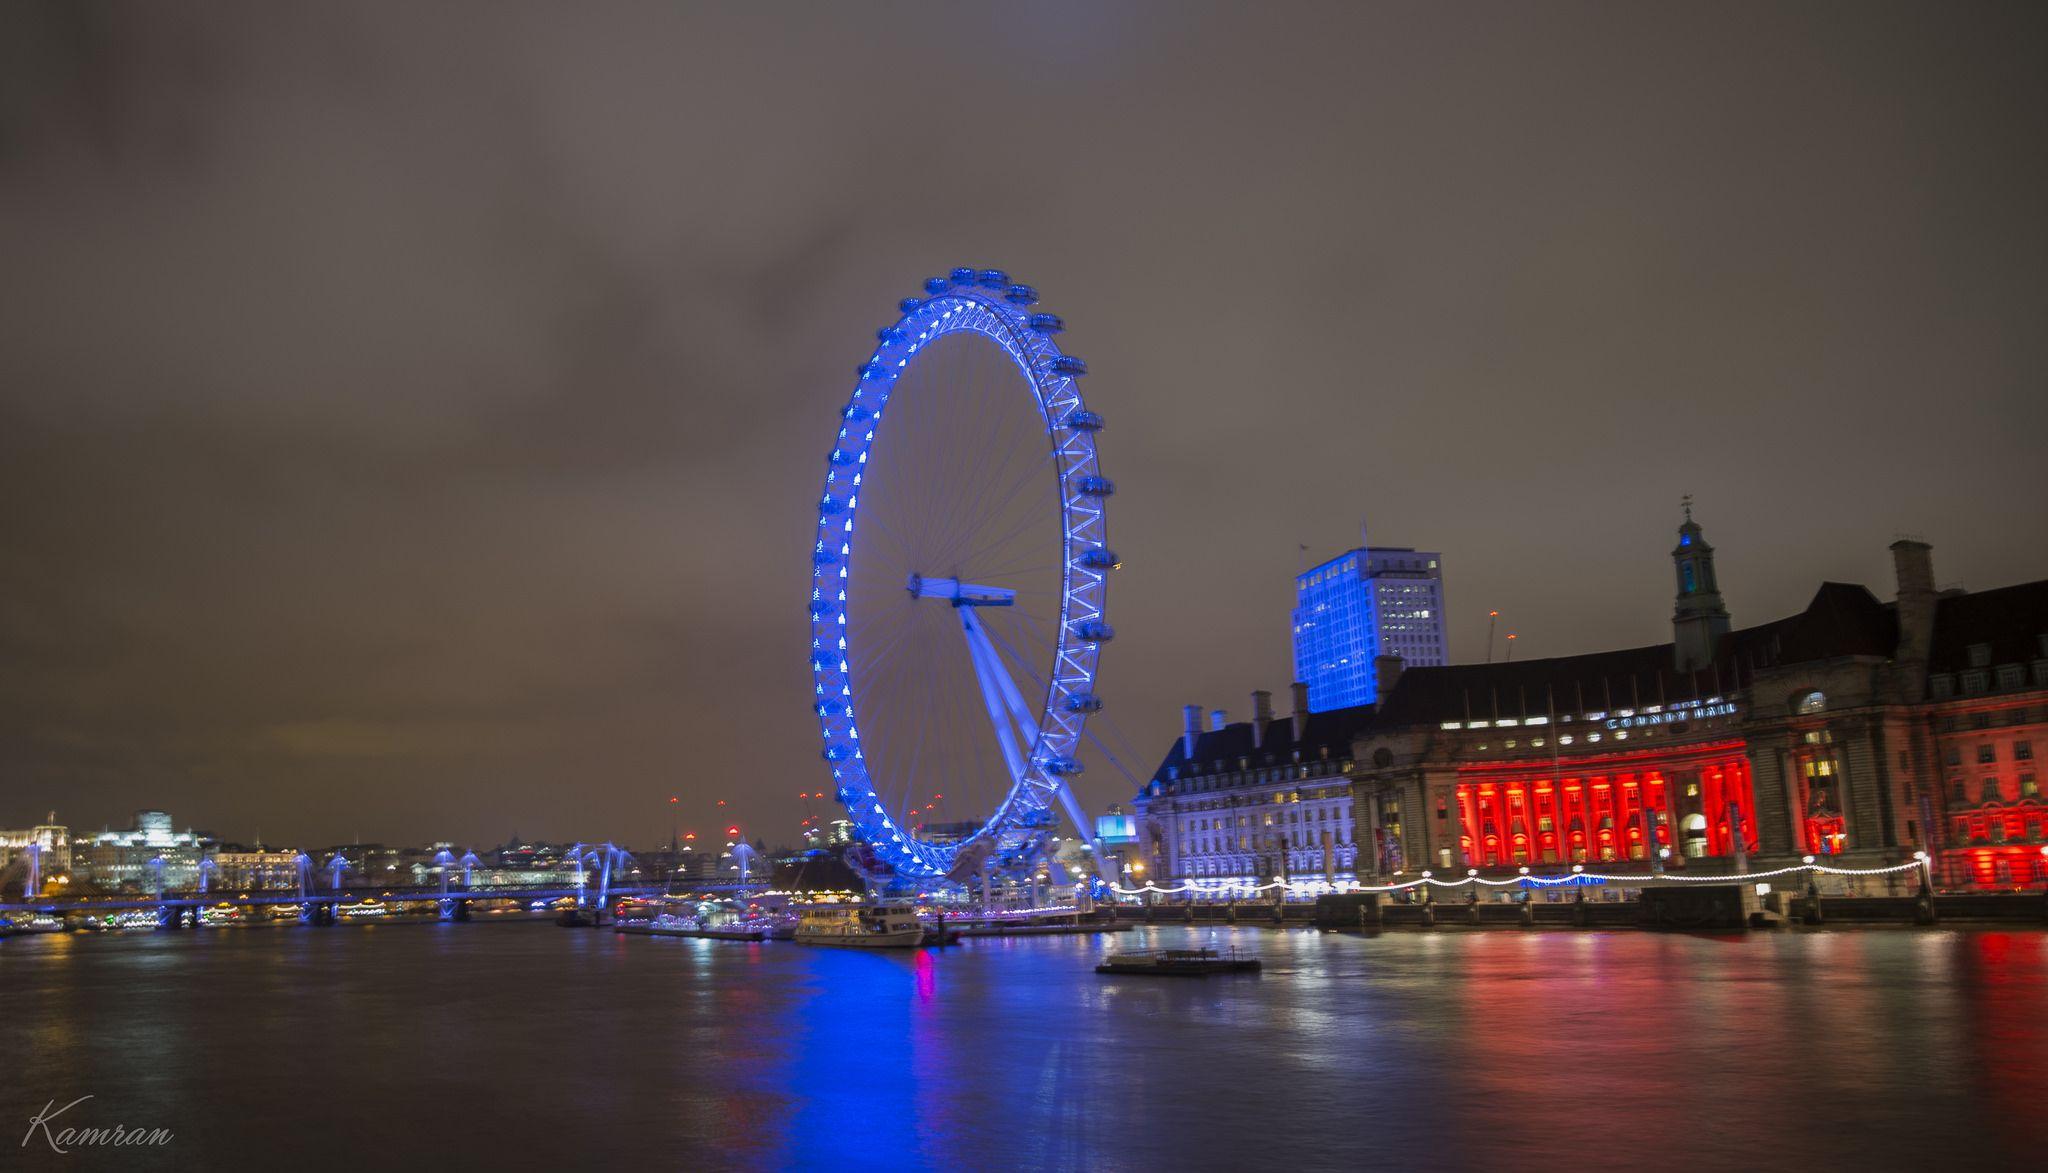 London Eye | Landscapes | London photographer, London eye